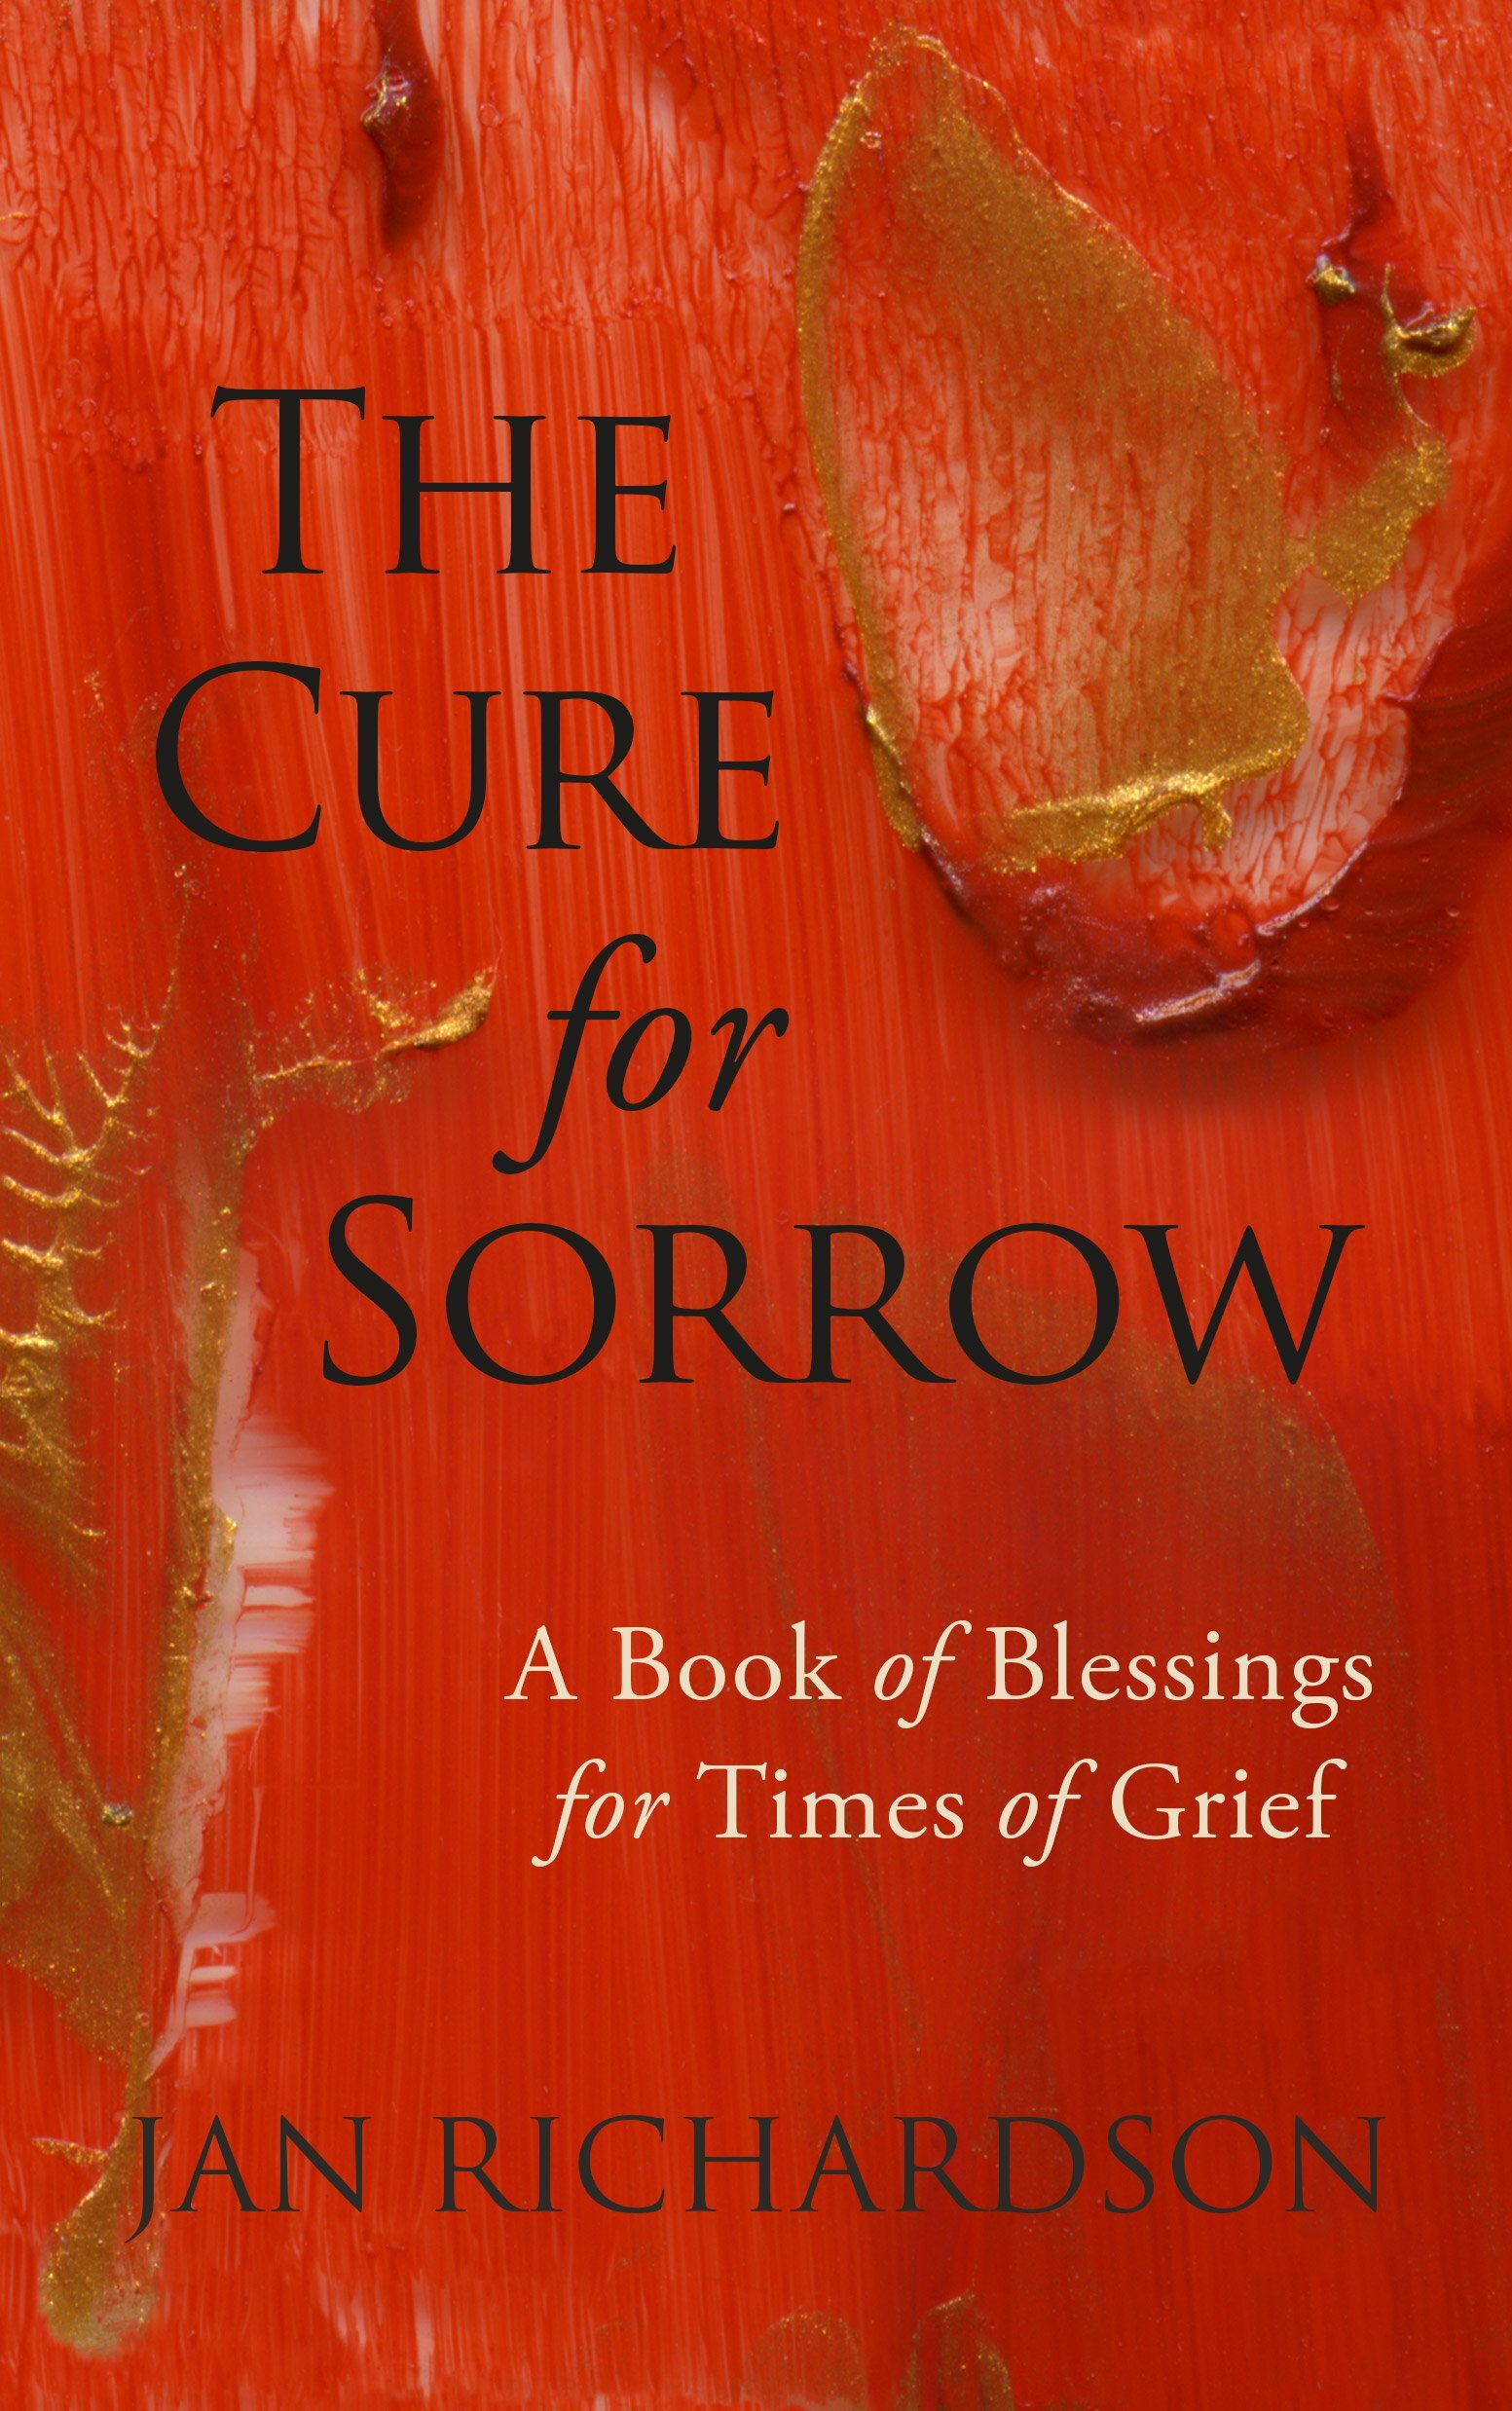 the cure for sorrow.jpg